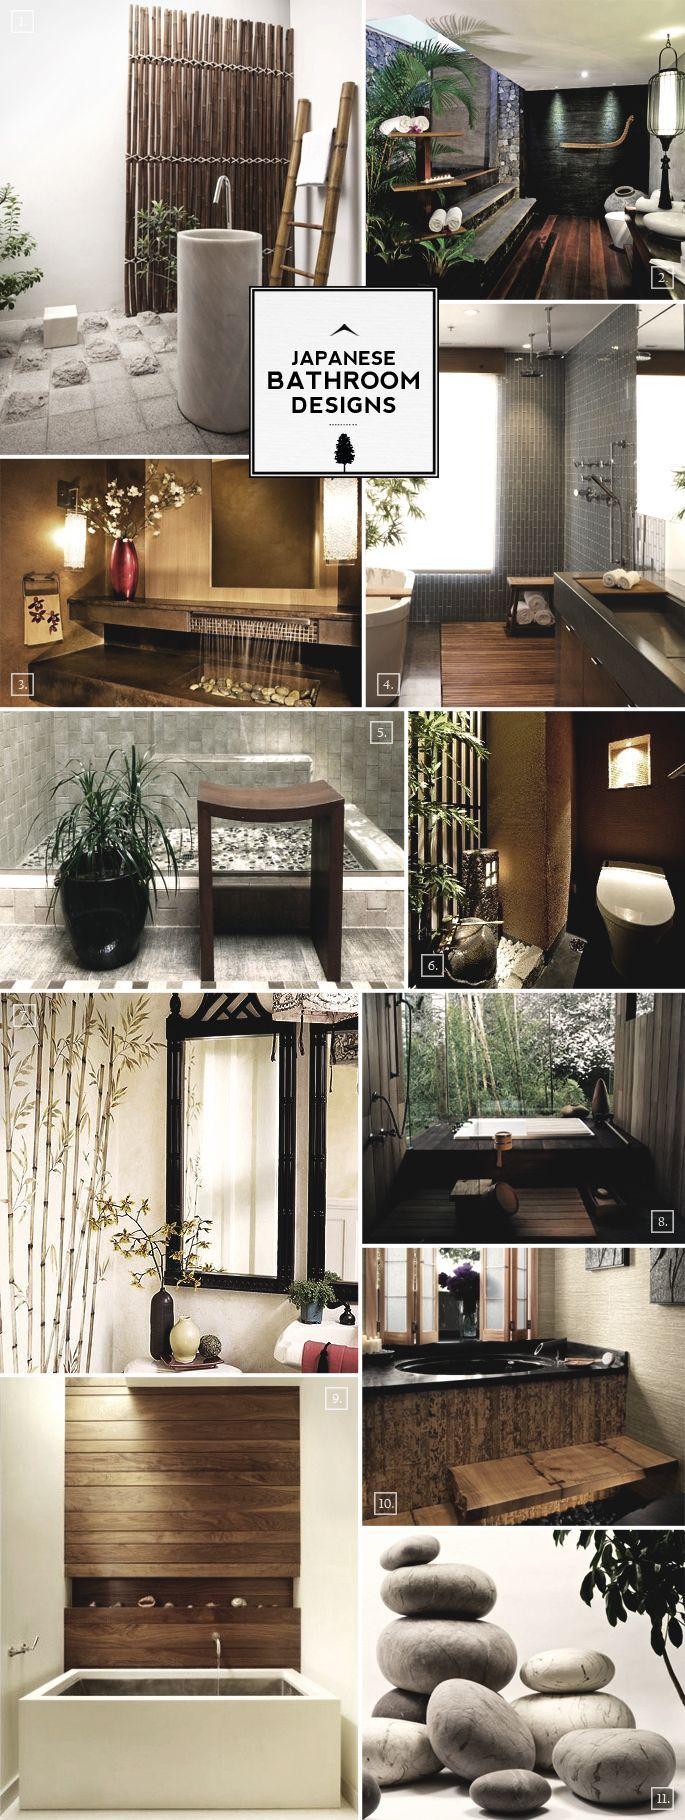 Zen Style Japanese Bathroom Design Ideas Beautiful Living